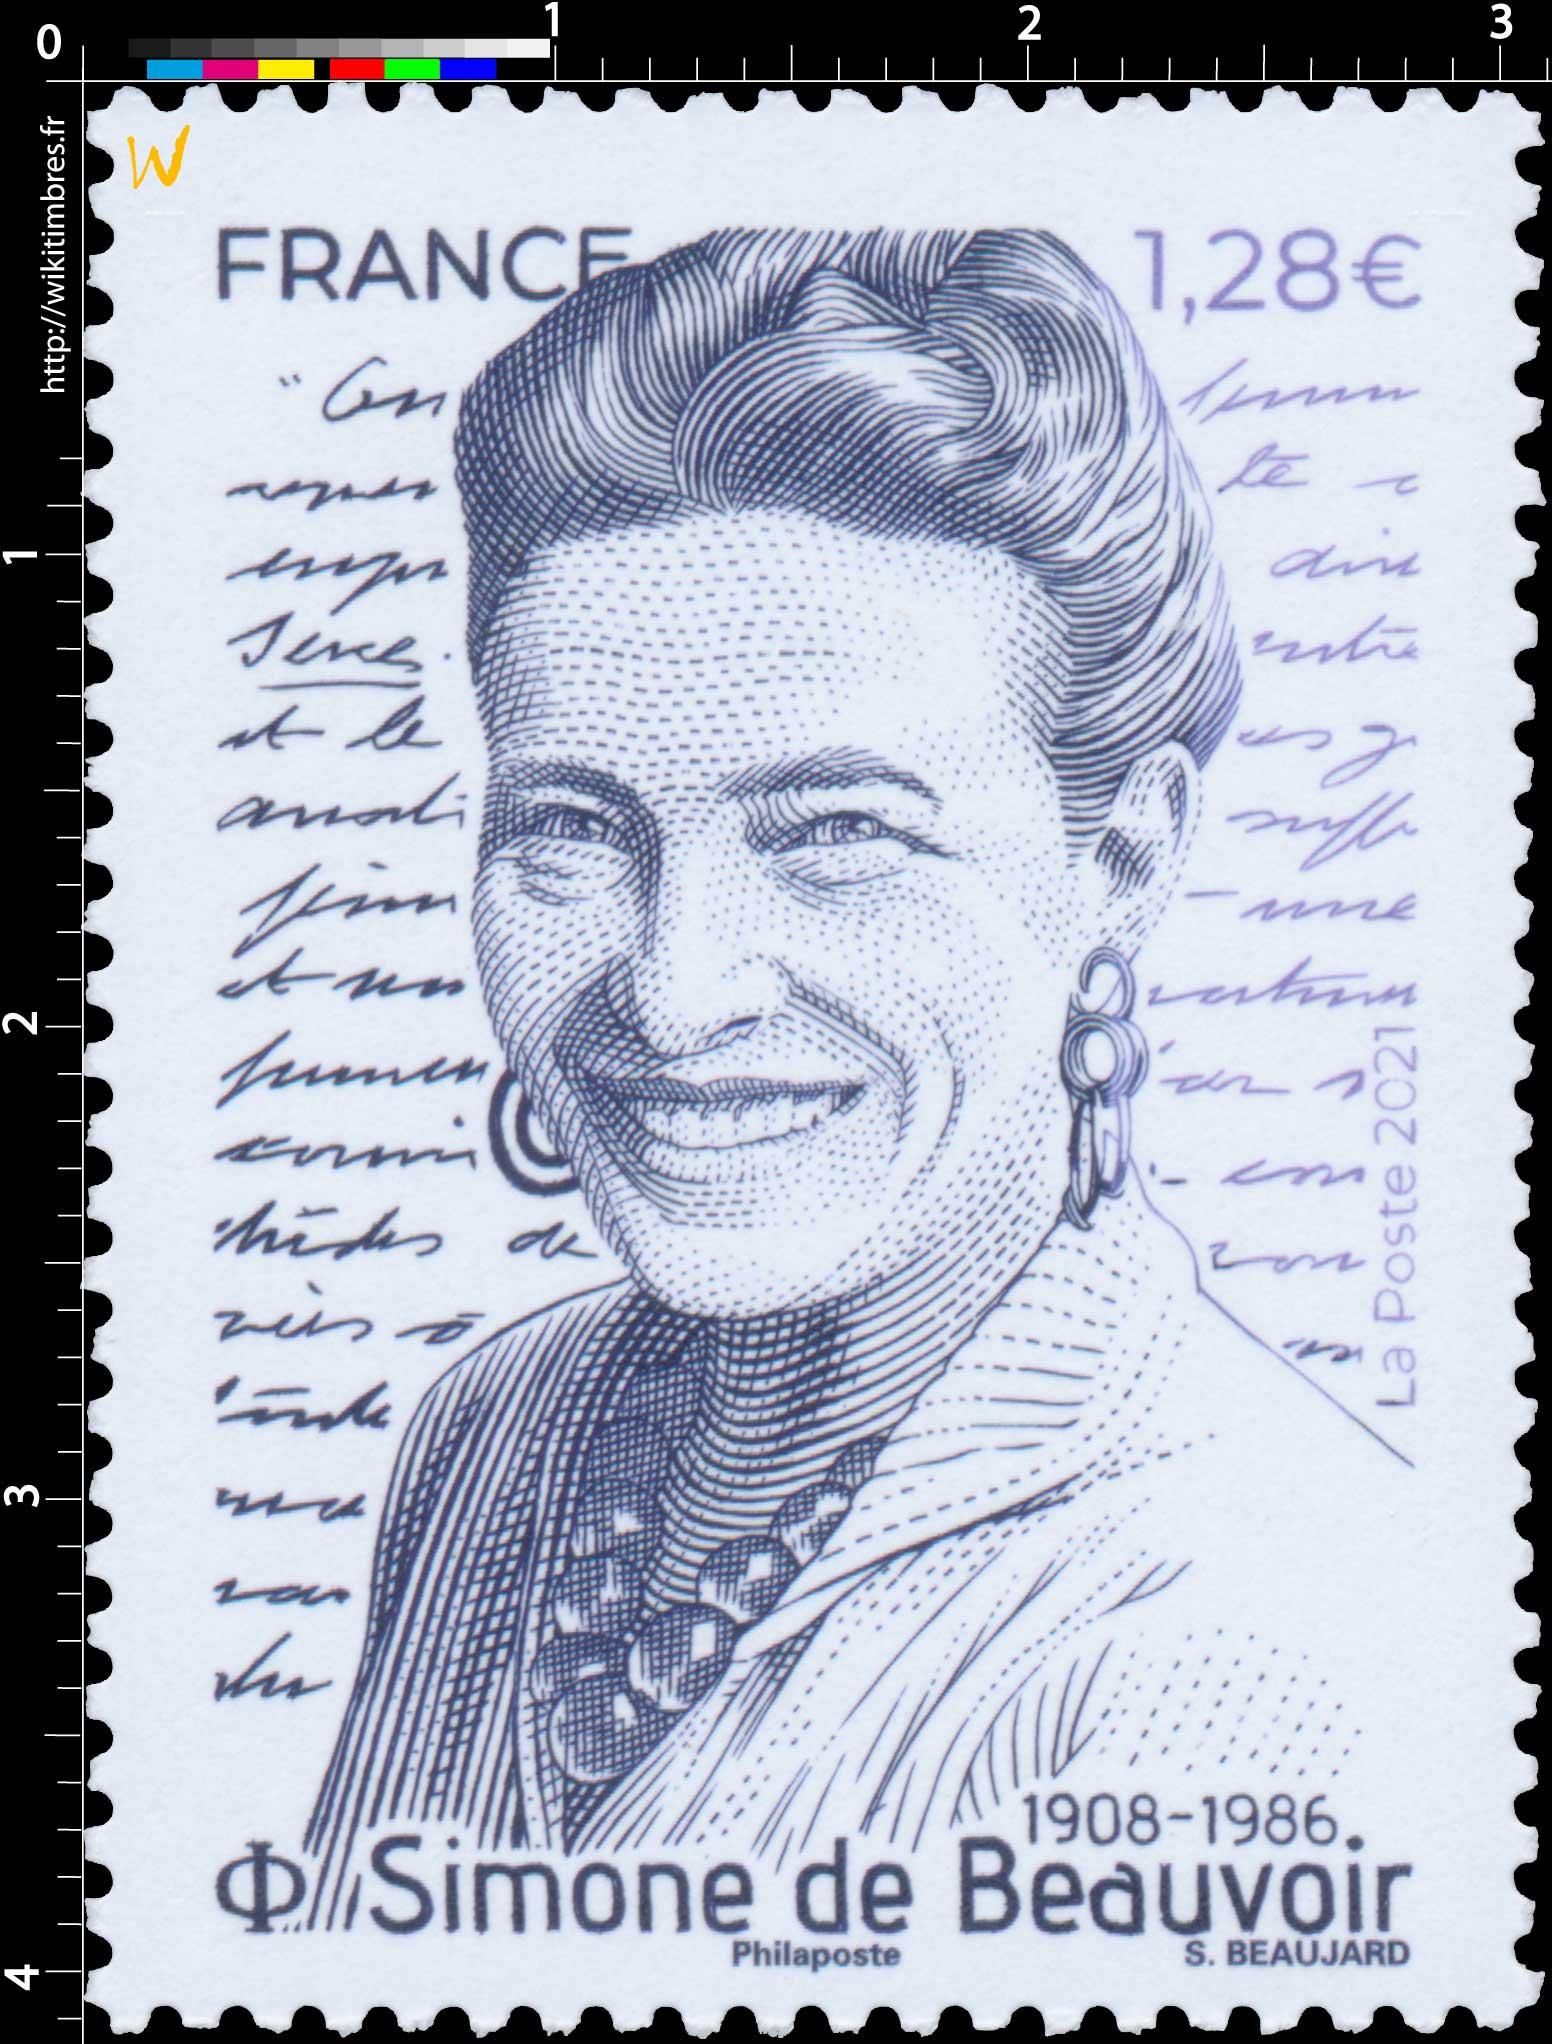 2021 Simone de Beauvoir 1908 - 1986